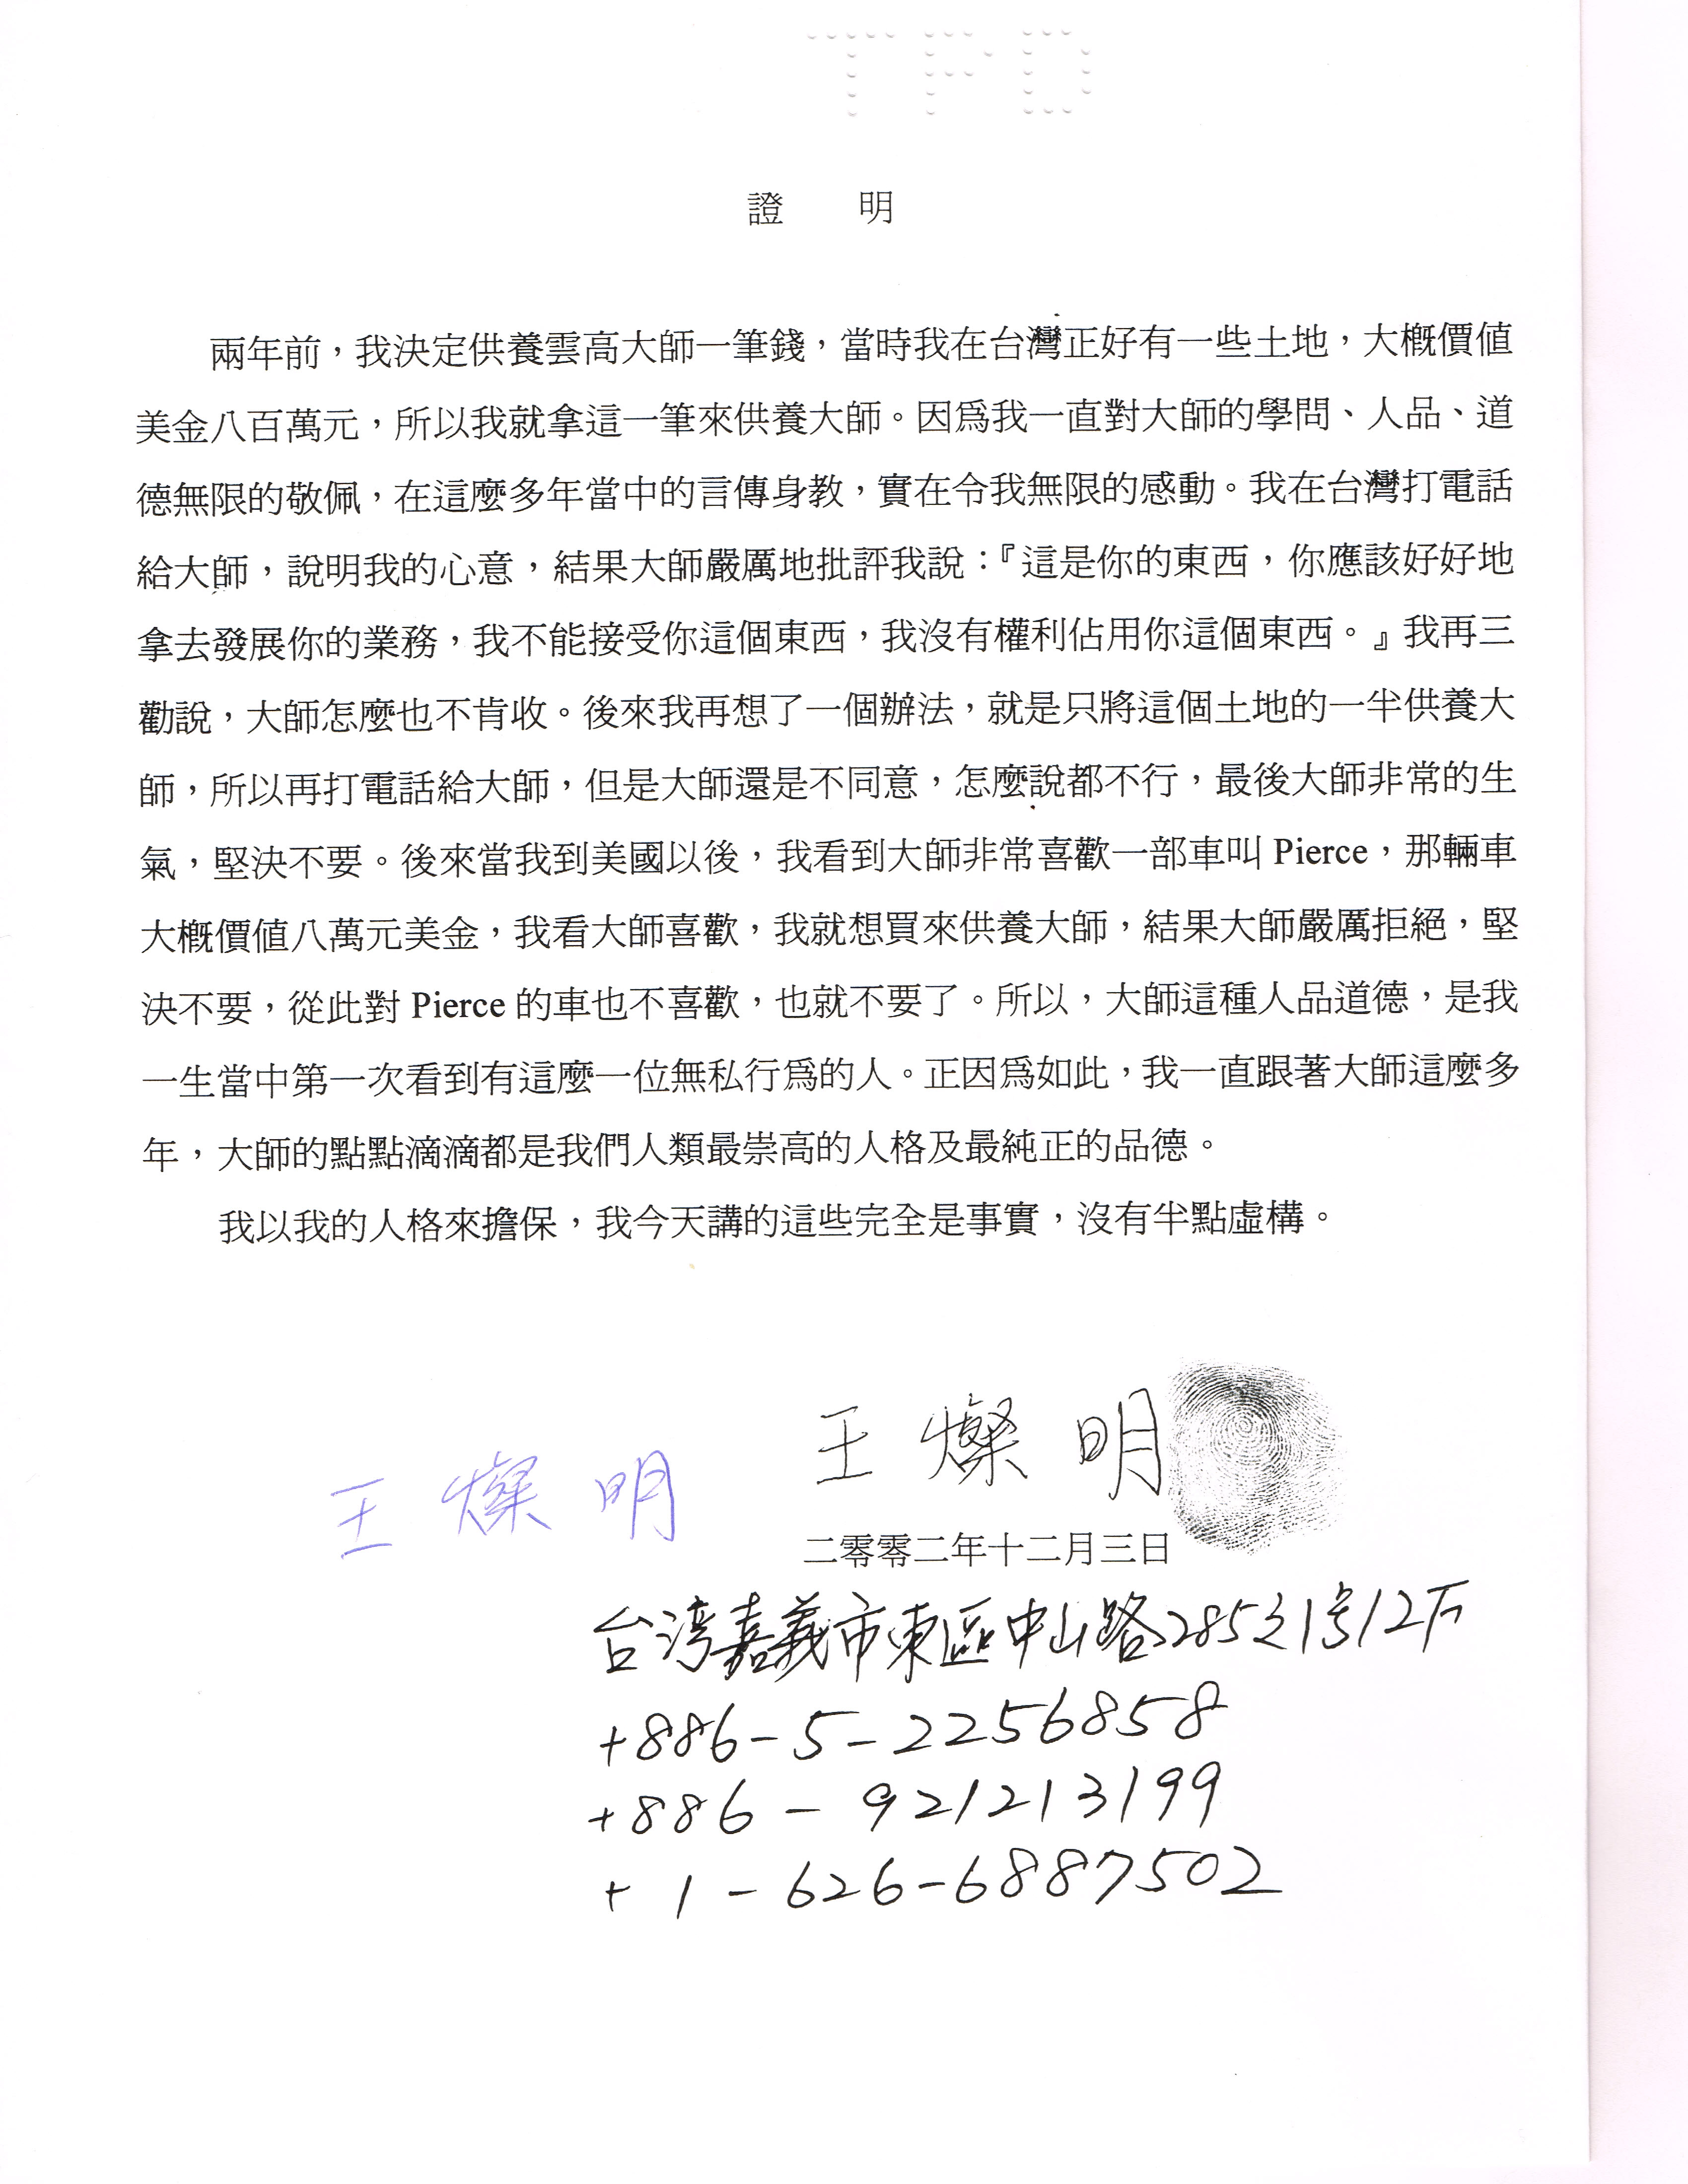 H.H.第三世多杰羌佛不收供養的部分證明_王燦明證明Page2